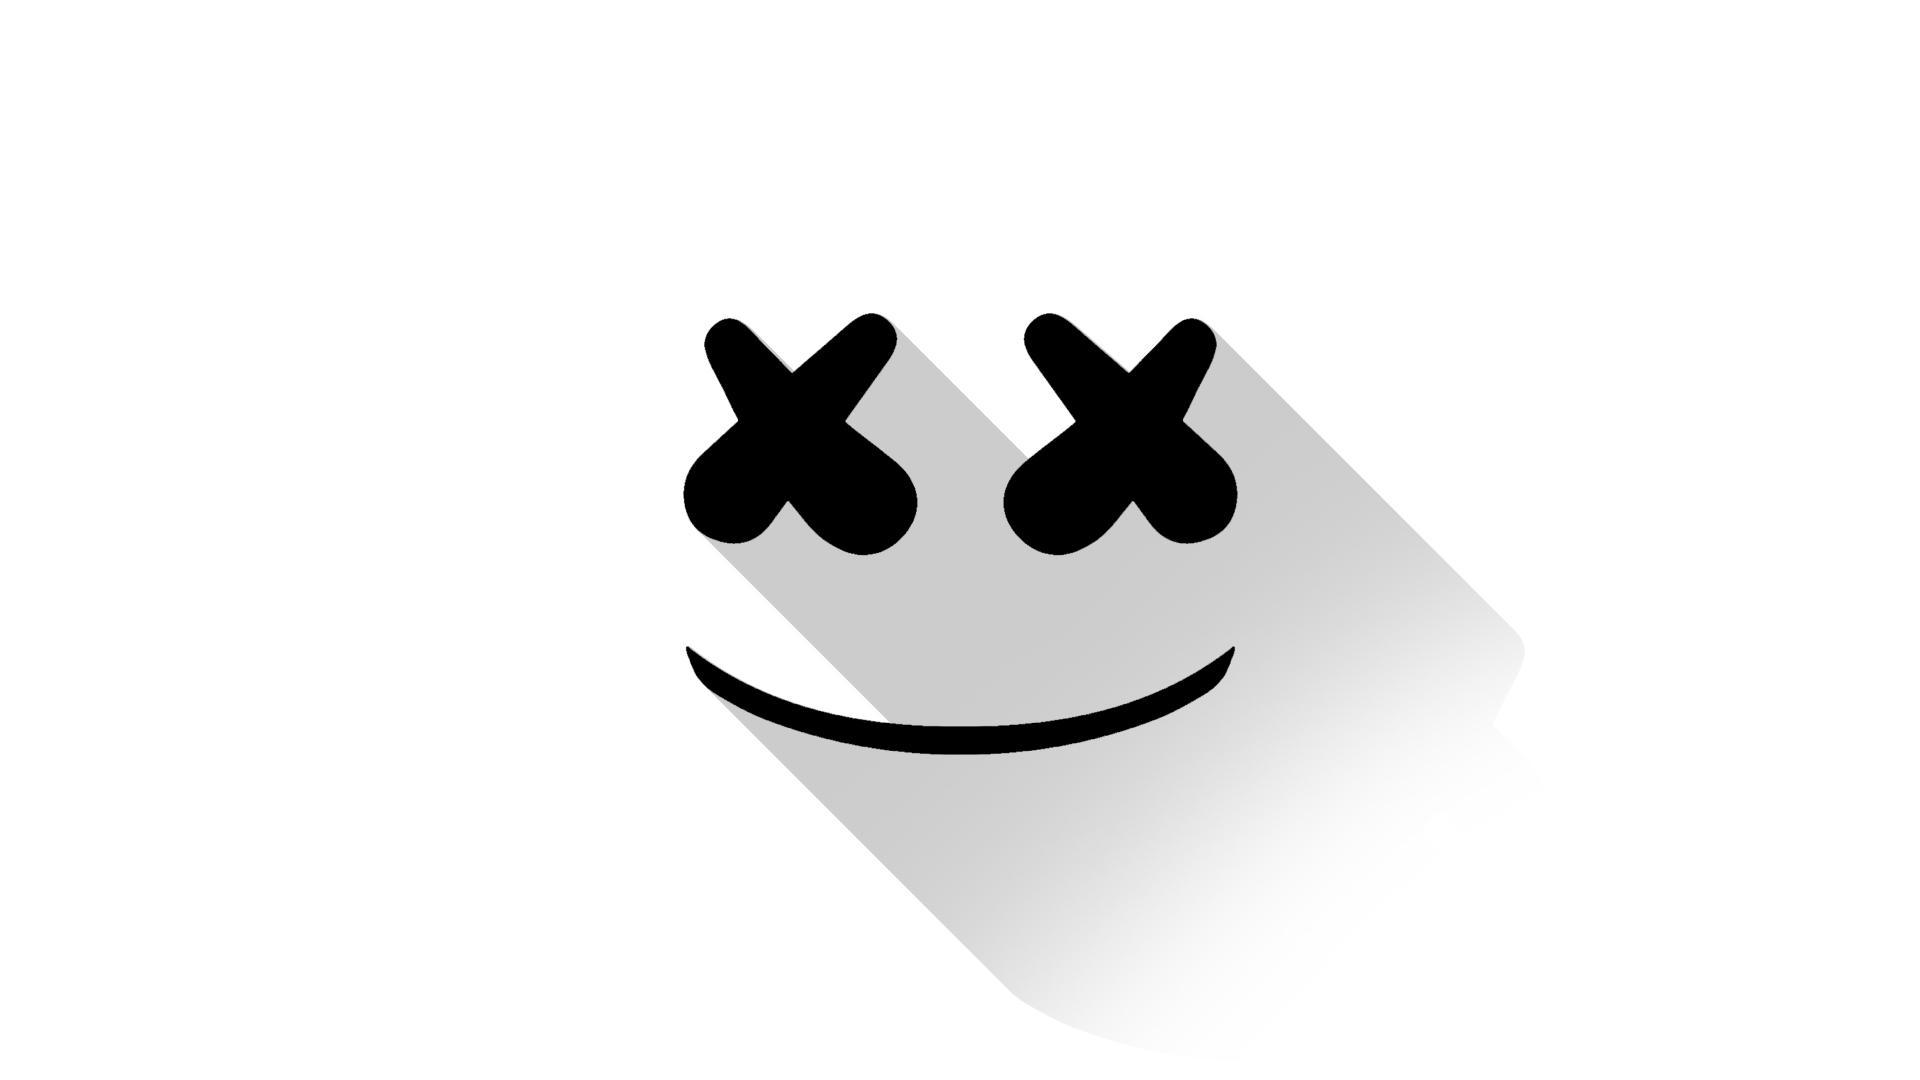 marshmello-dj-material-design-logo-to